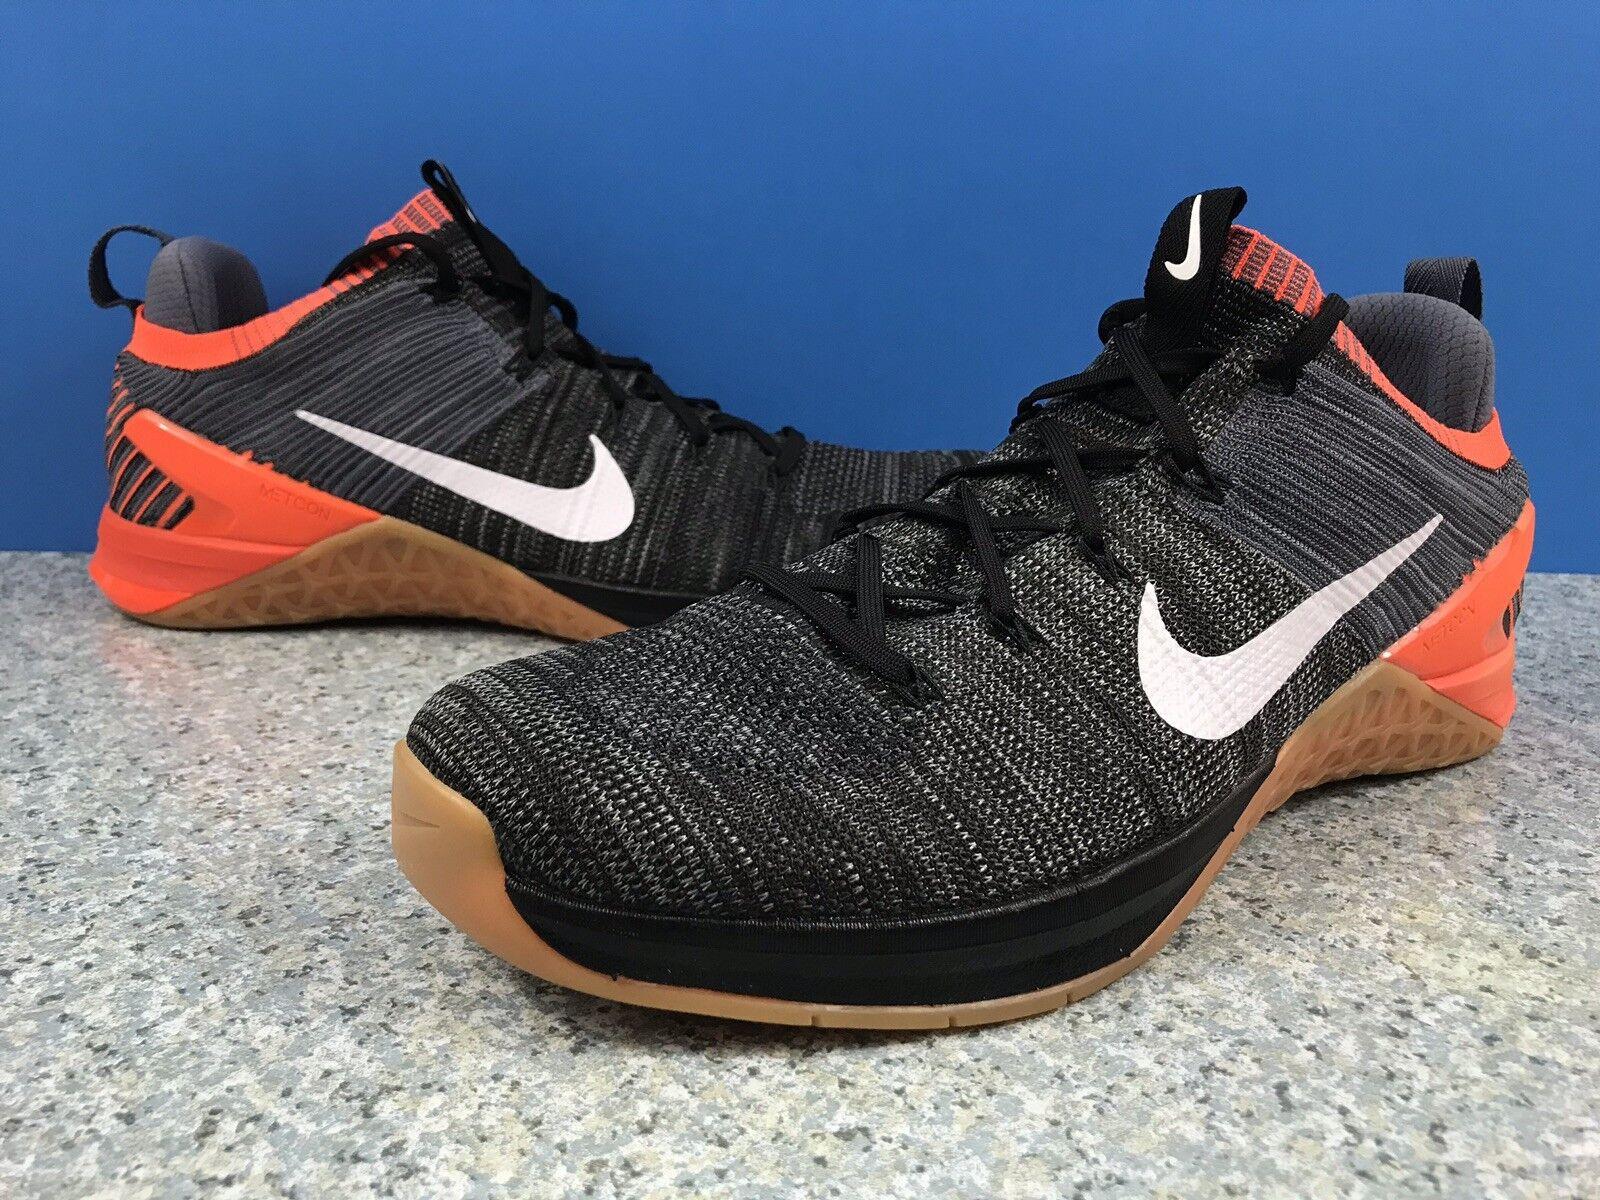 9de0600e04d0e Nike Metcon DSX DSX DSX Flyknit 2 Black White Crimson 924423 005 Sz 14  Cross Training